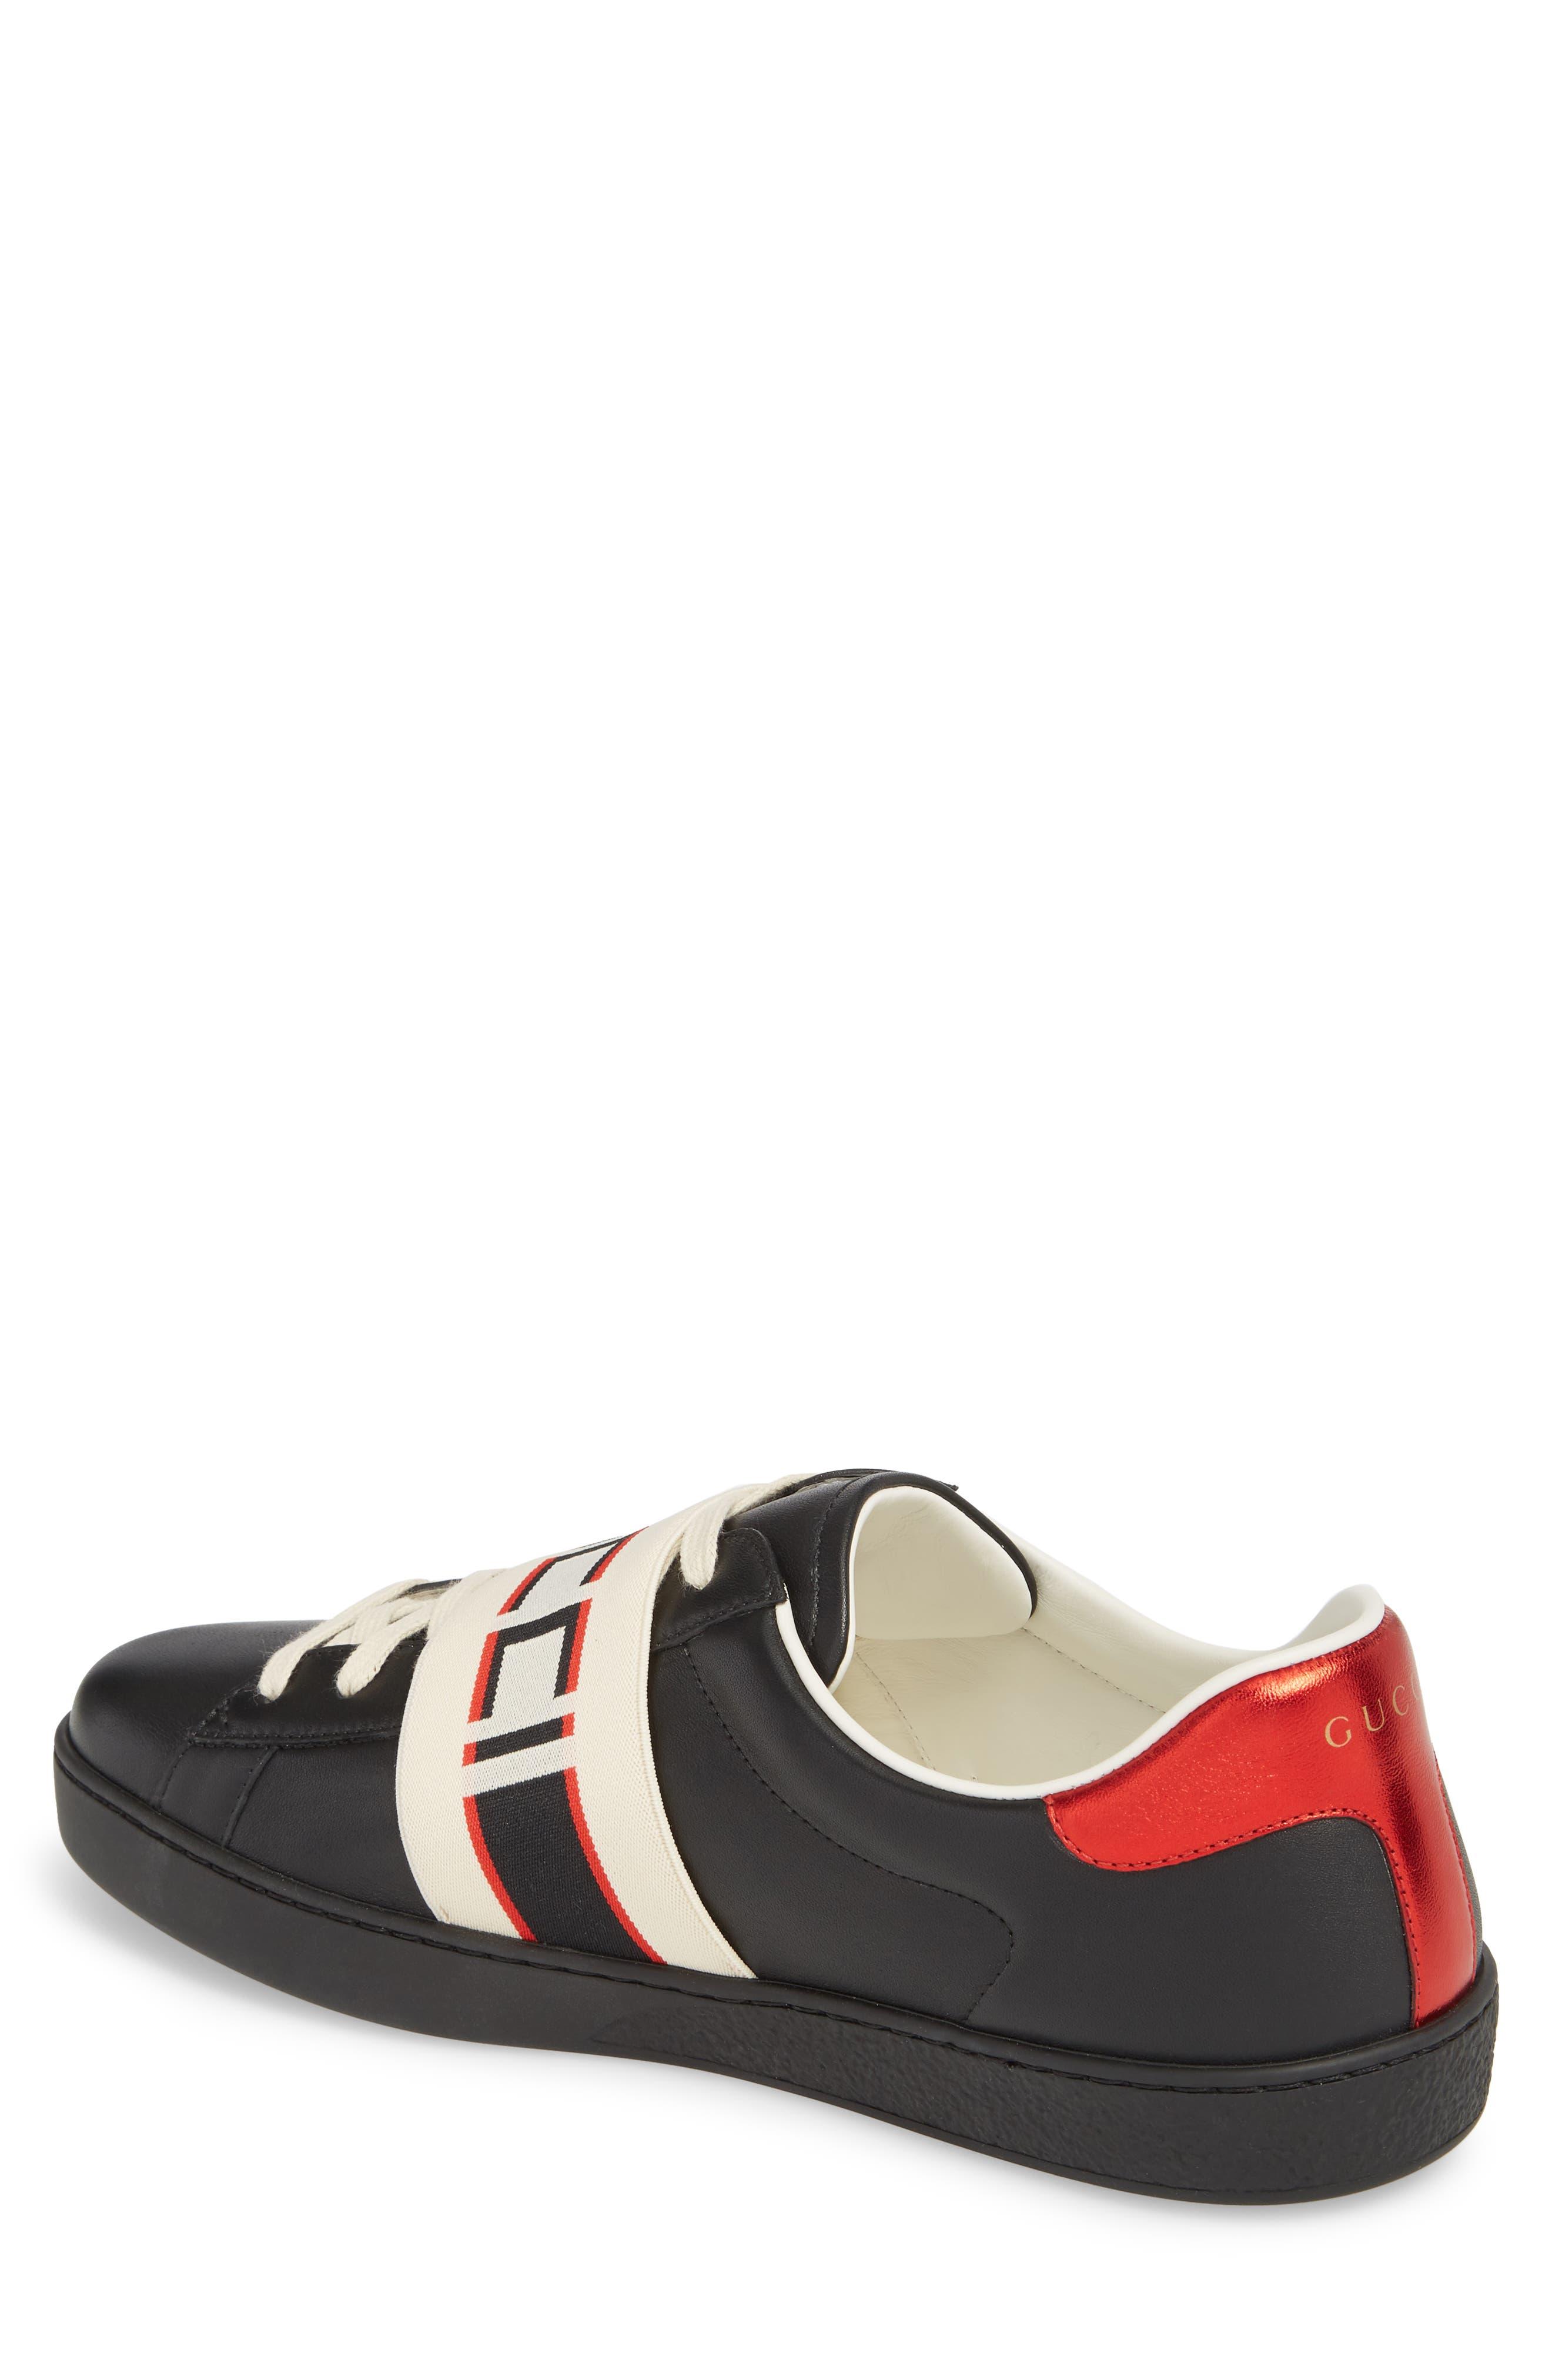 GUCCI, New Ace Stripe Leather Sneaker, Alternate thumbnail 2, color, BLACK